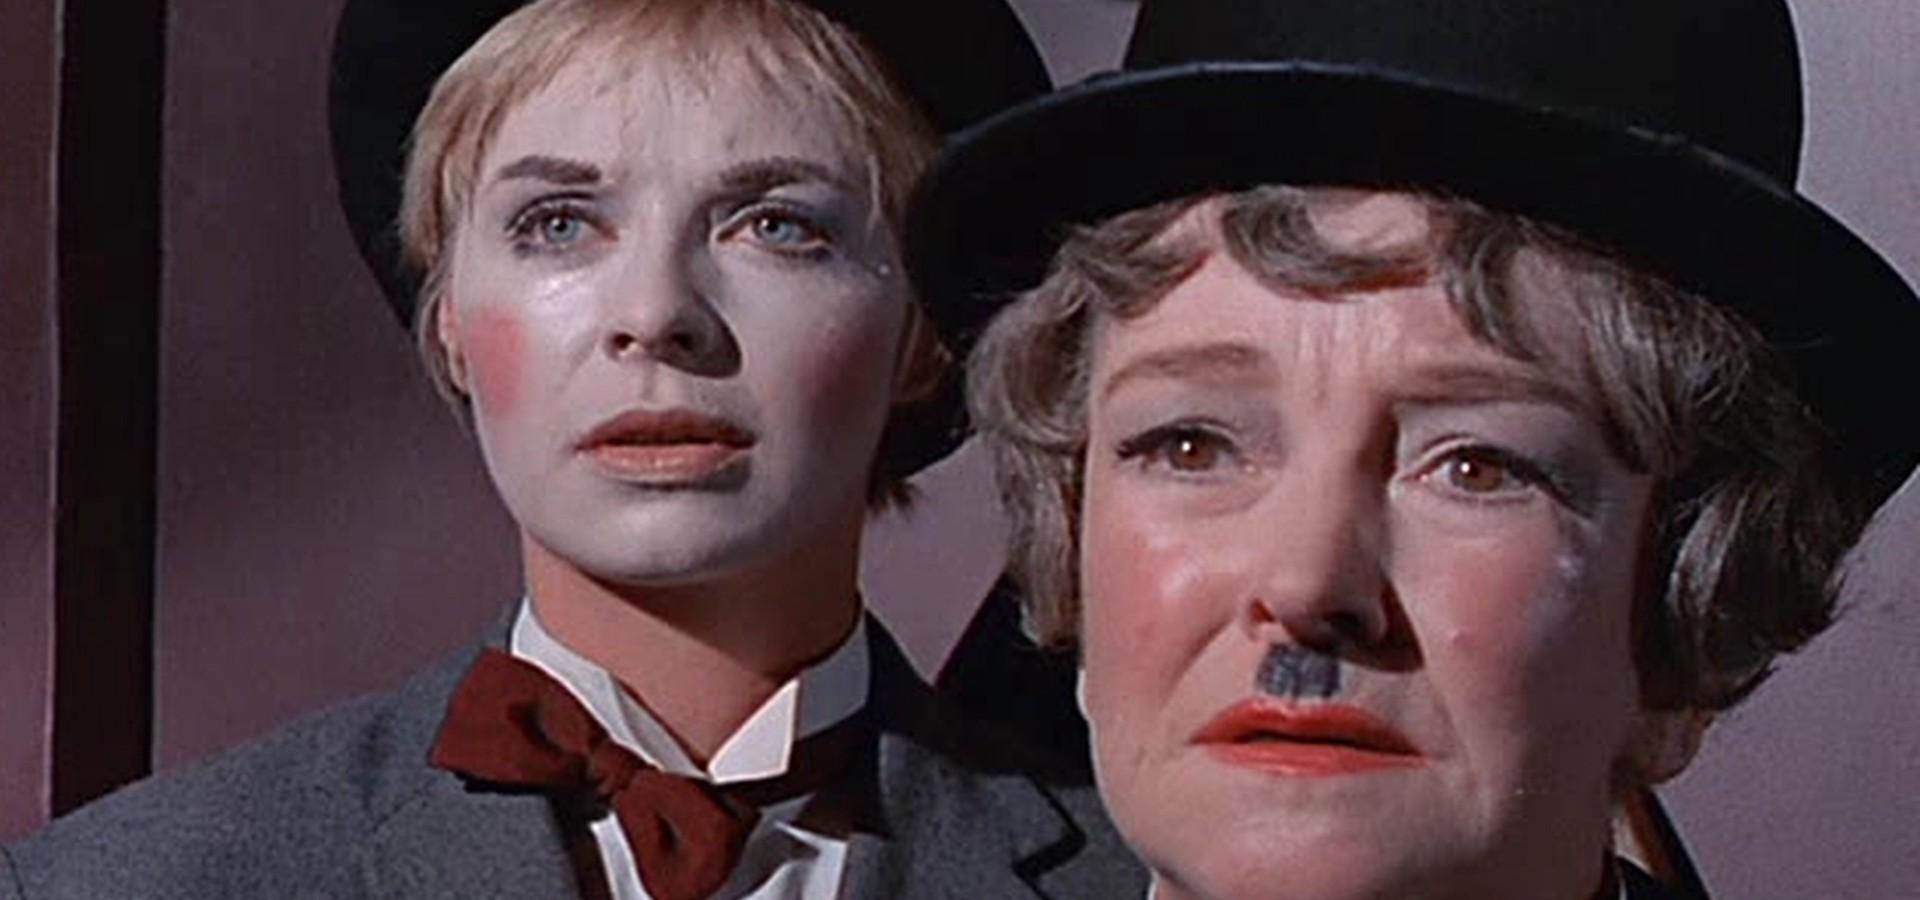 Lizzie (El asesinato de la familia Borden)